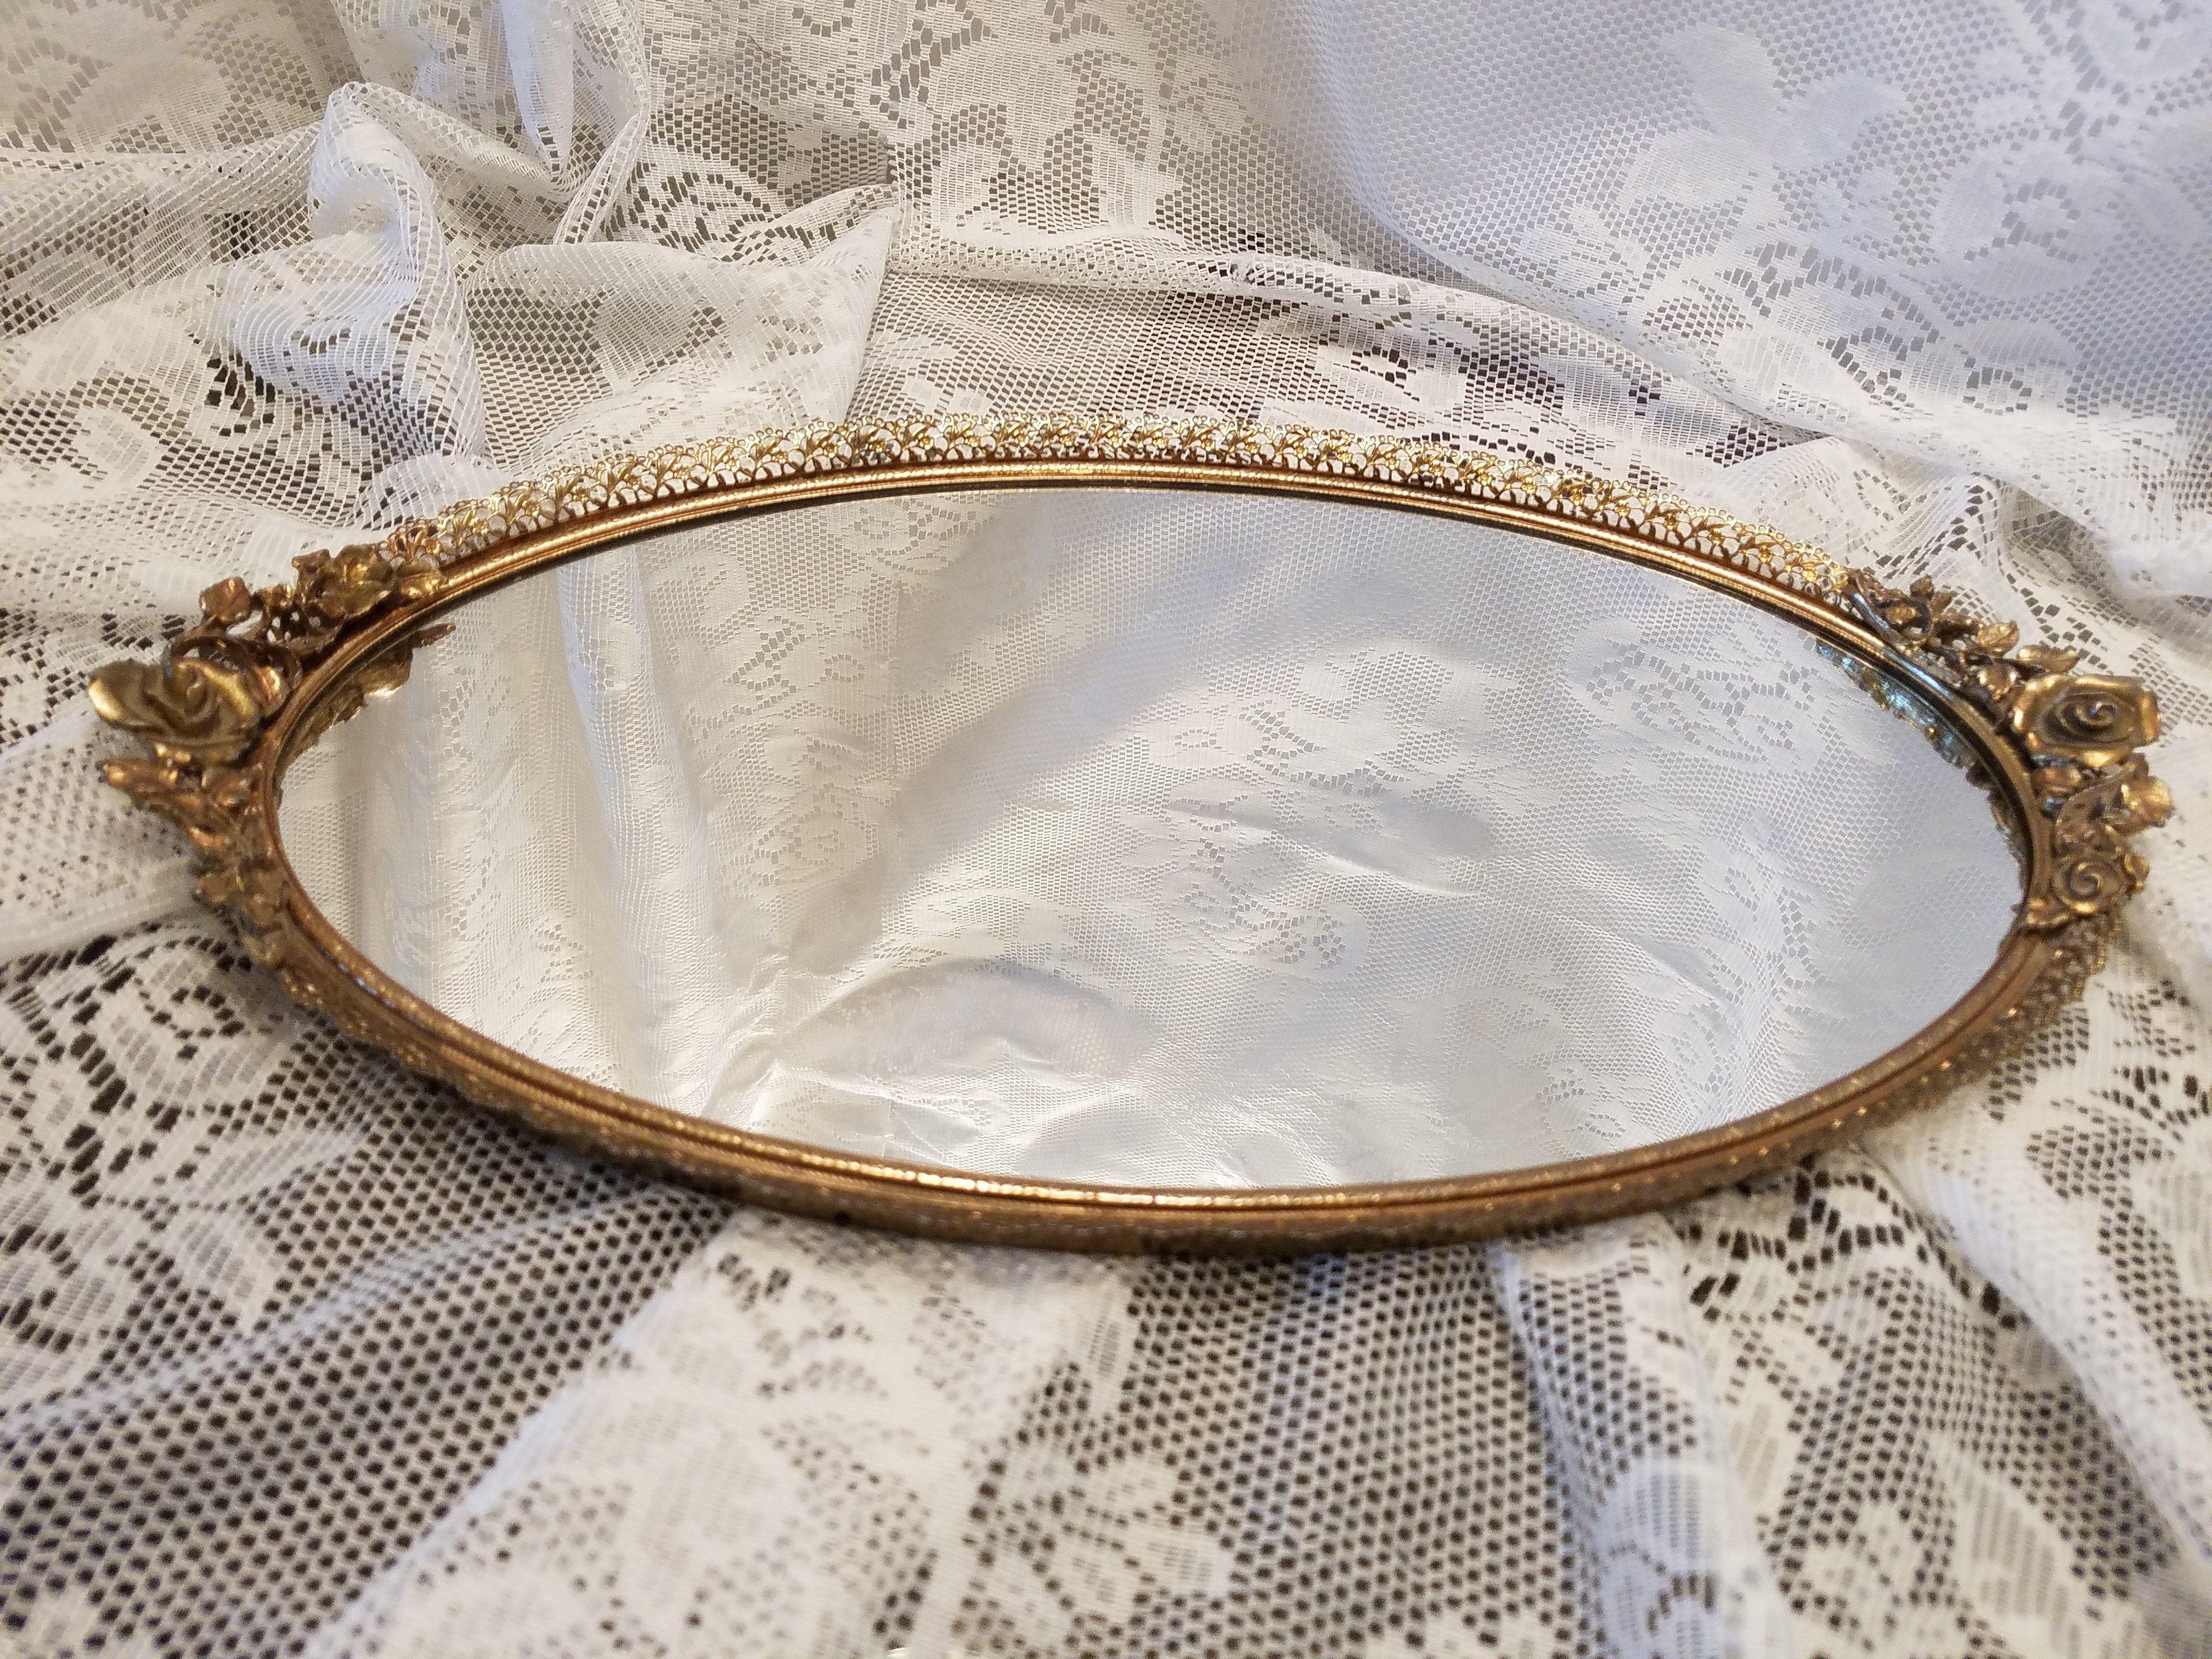 Matson Vintage Vanity Dresser Mirror Tray Mid Century Ormolu Tray Rose Handles Jewelry Tray Boudoir Tray Perfume Display Jewelry Tray Dresser With Mirror